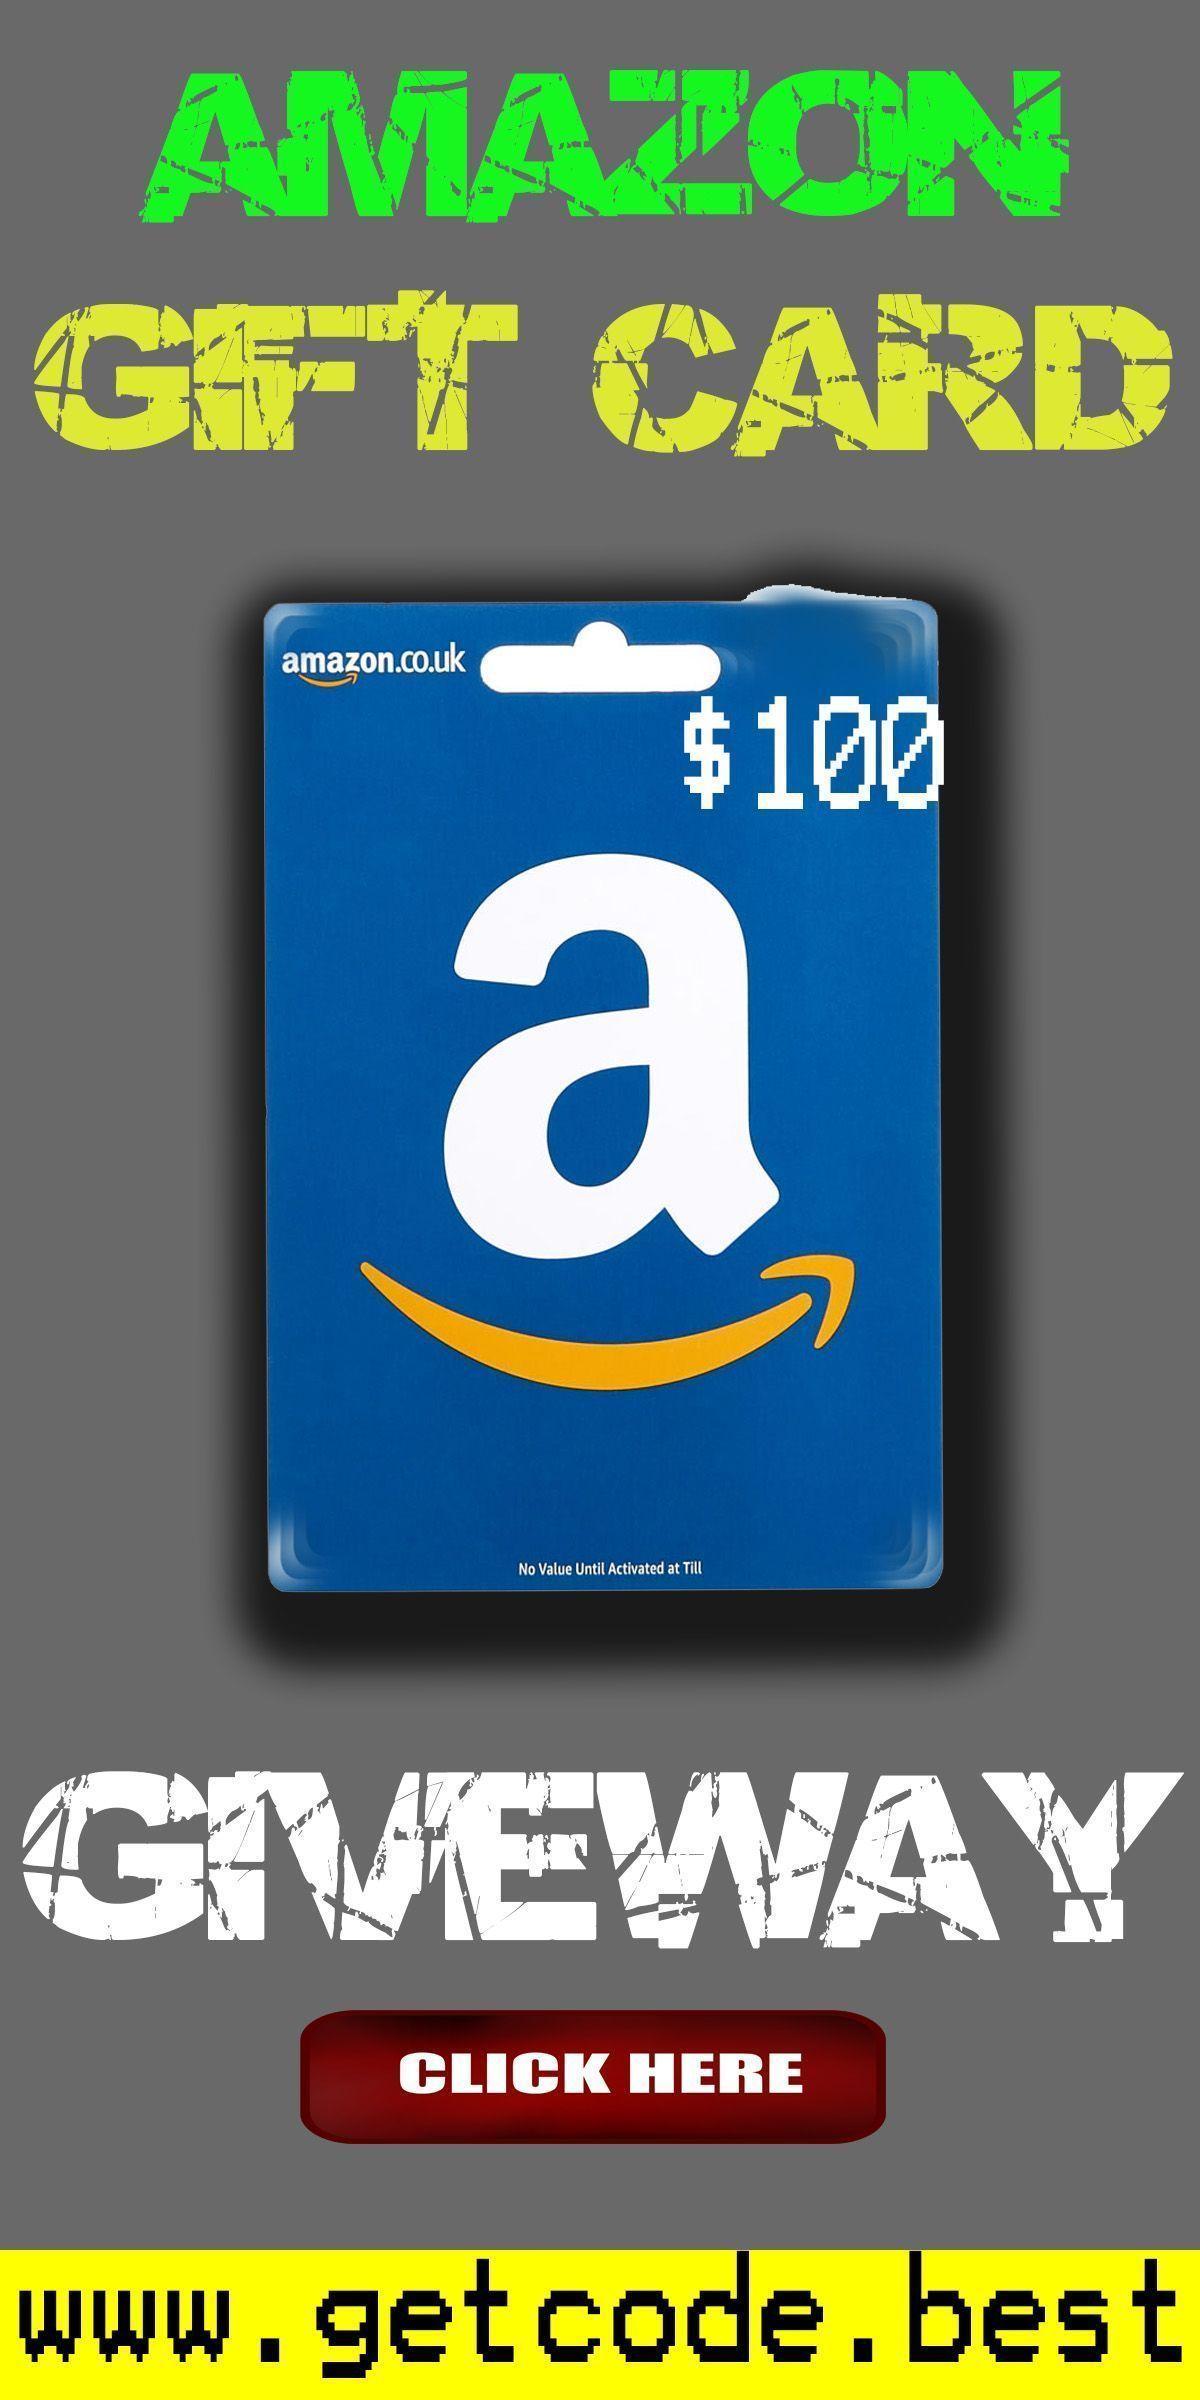 Free Amazon 100 Gift Card Gift Promotional Amazon 100 Gift Card Love Amazon Gift Card Free Amazon Gift Cards Gift Card Giveaway